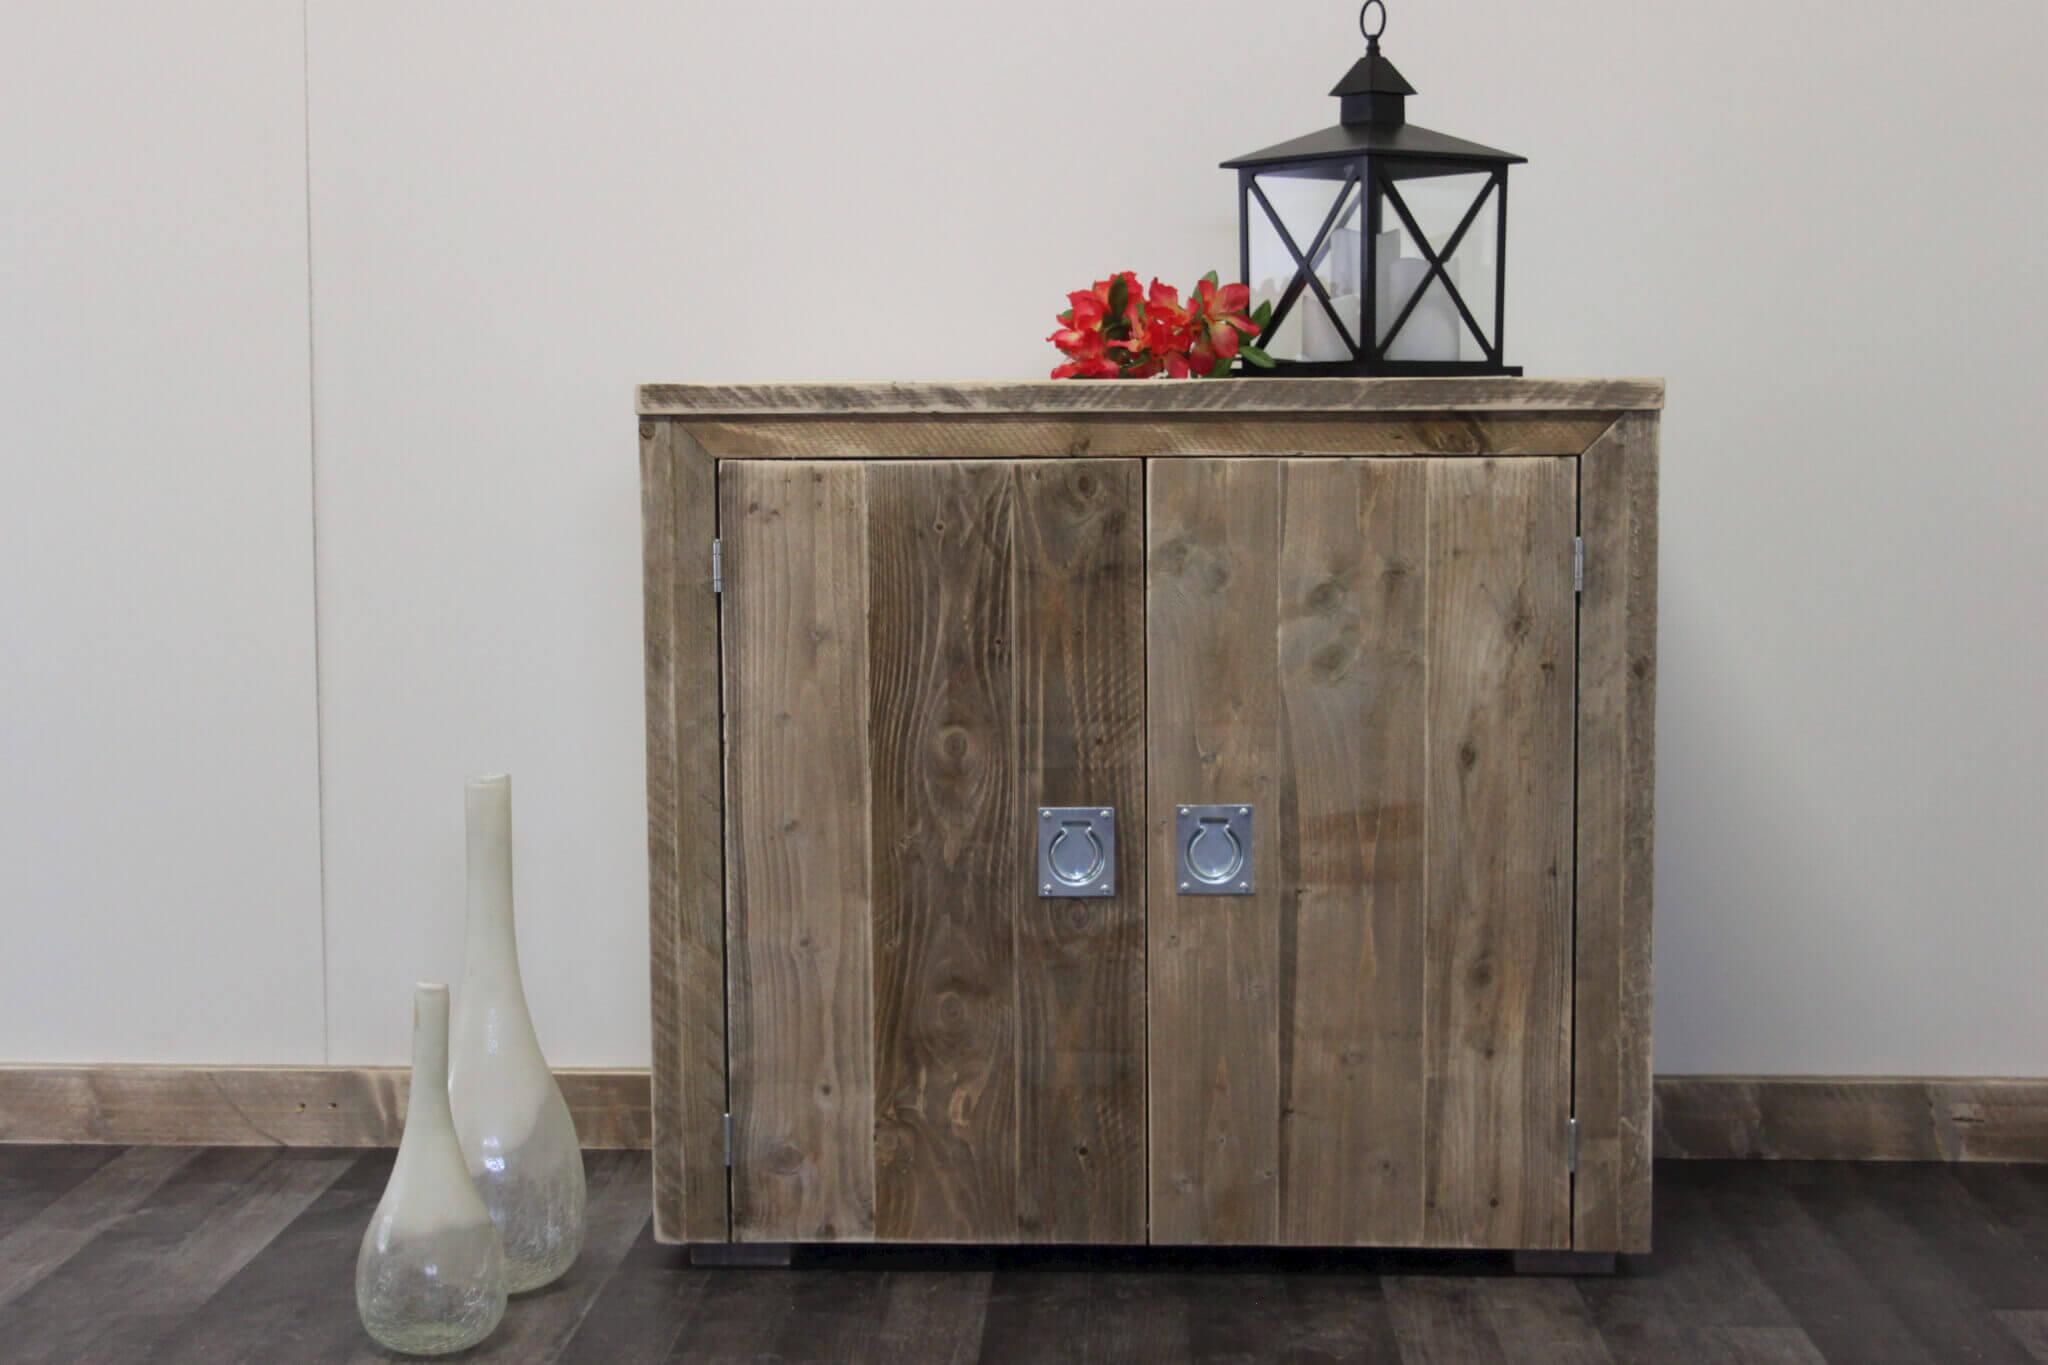 Ikea keuken configurator : ikea badkamerplanner unit. ikea ...